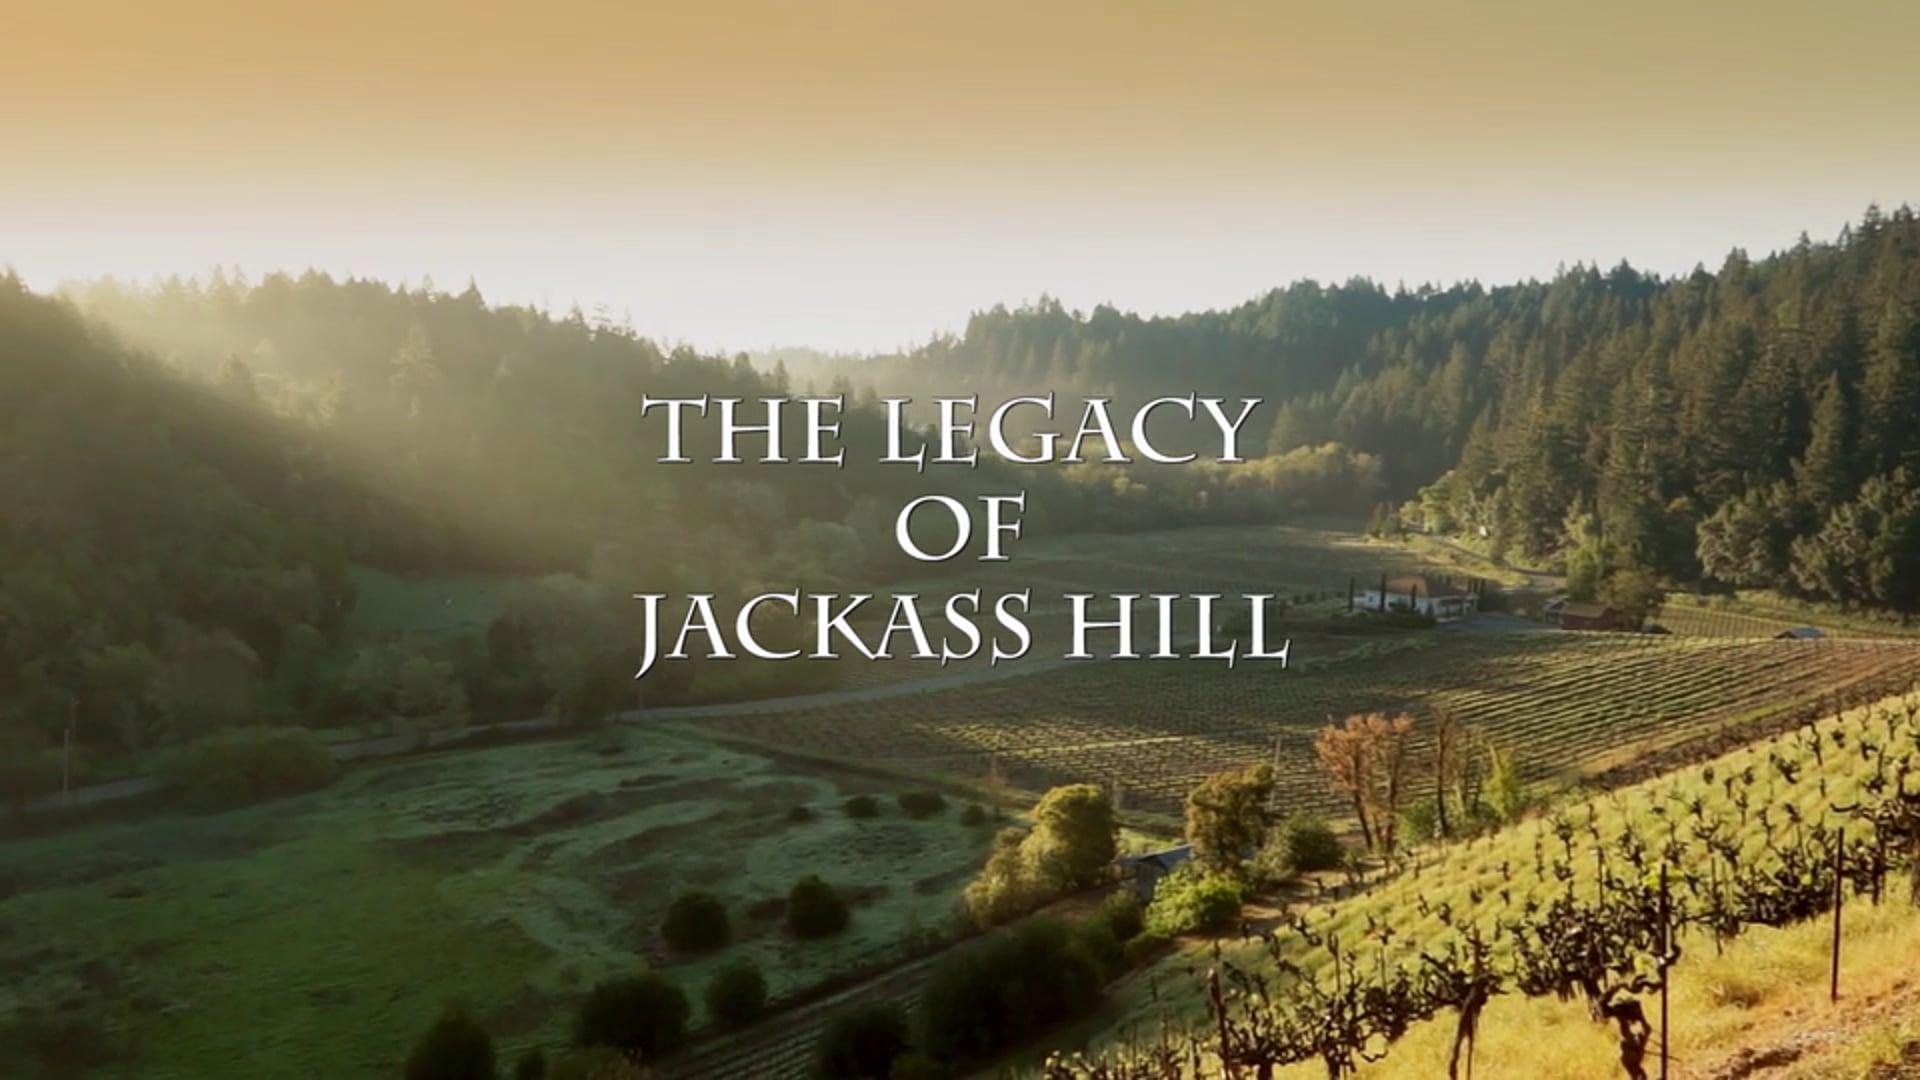 The Legacy of Jackass Hill - Wine Spectator Grand Prize Winner 2015